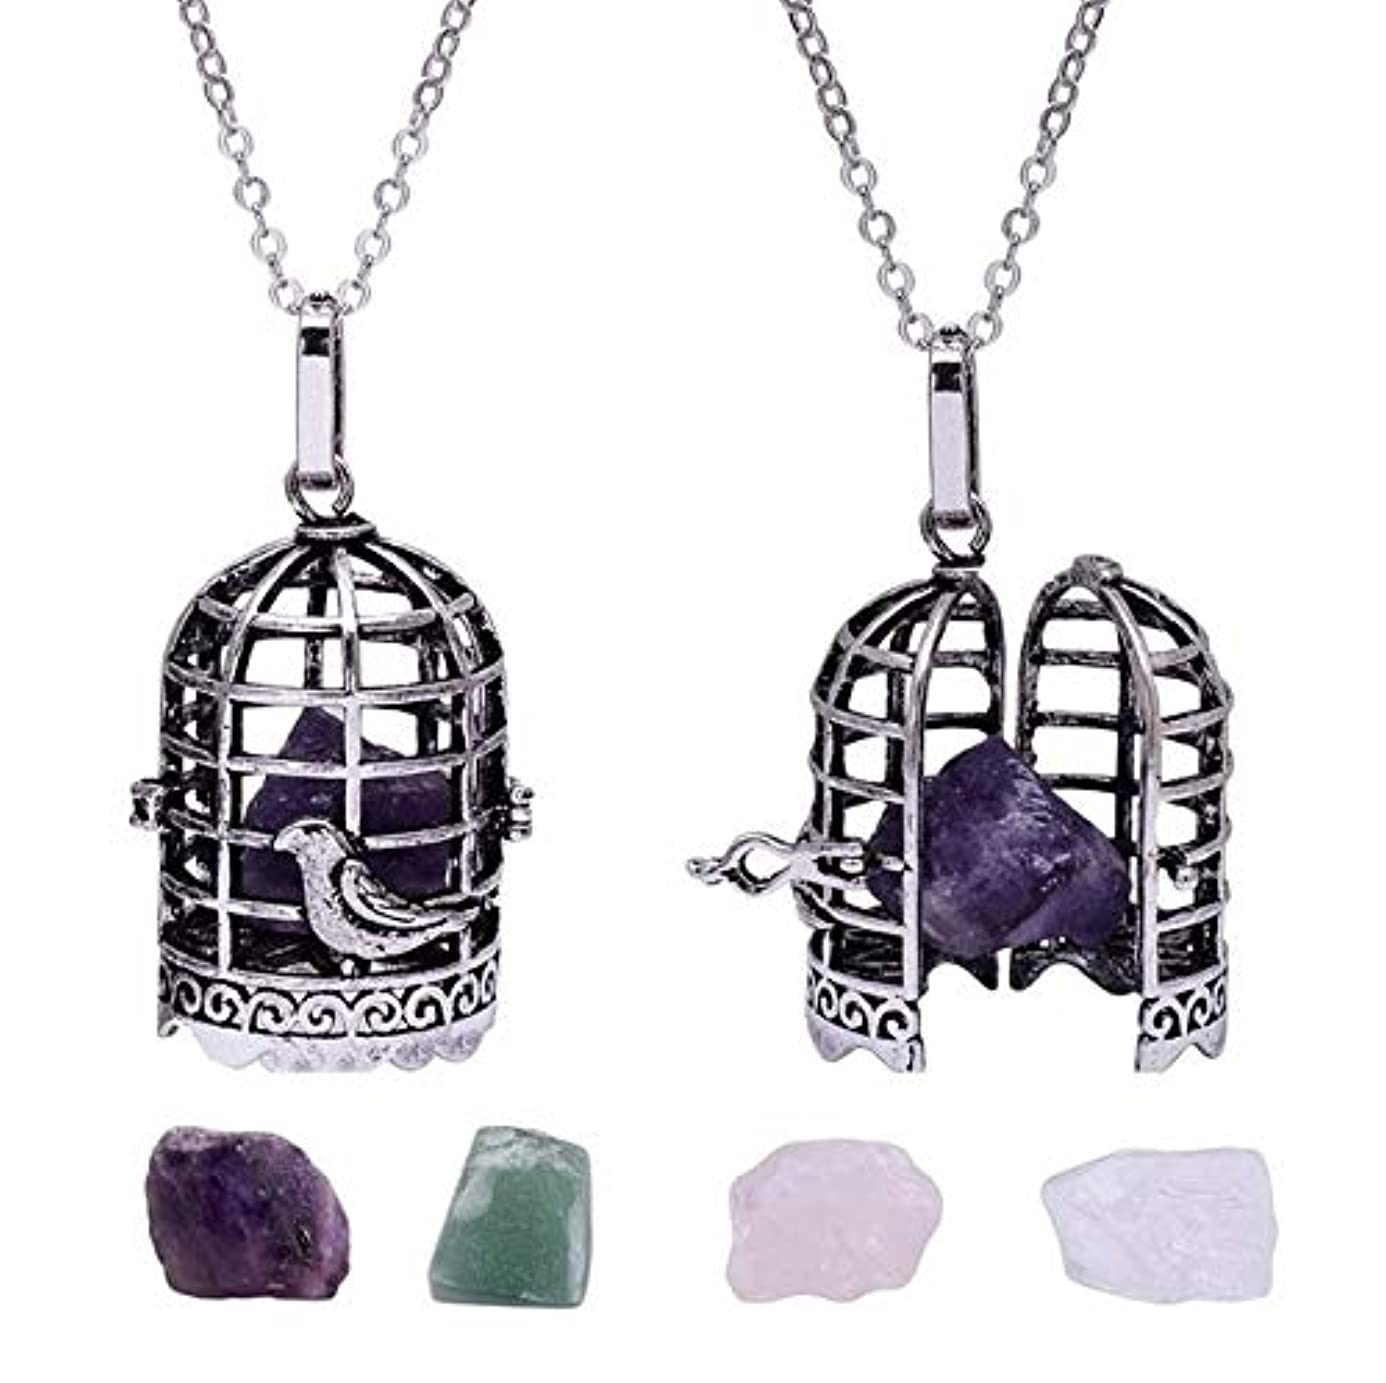 Pendants - 1PC Antique Silver Crystal Bird Cage Pendant Necklace Locket Interchangeable Rock Stone Necklace For Women - Amethyst